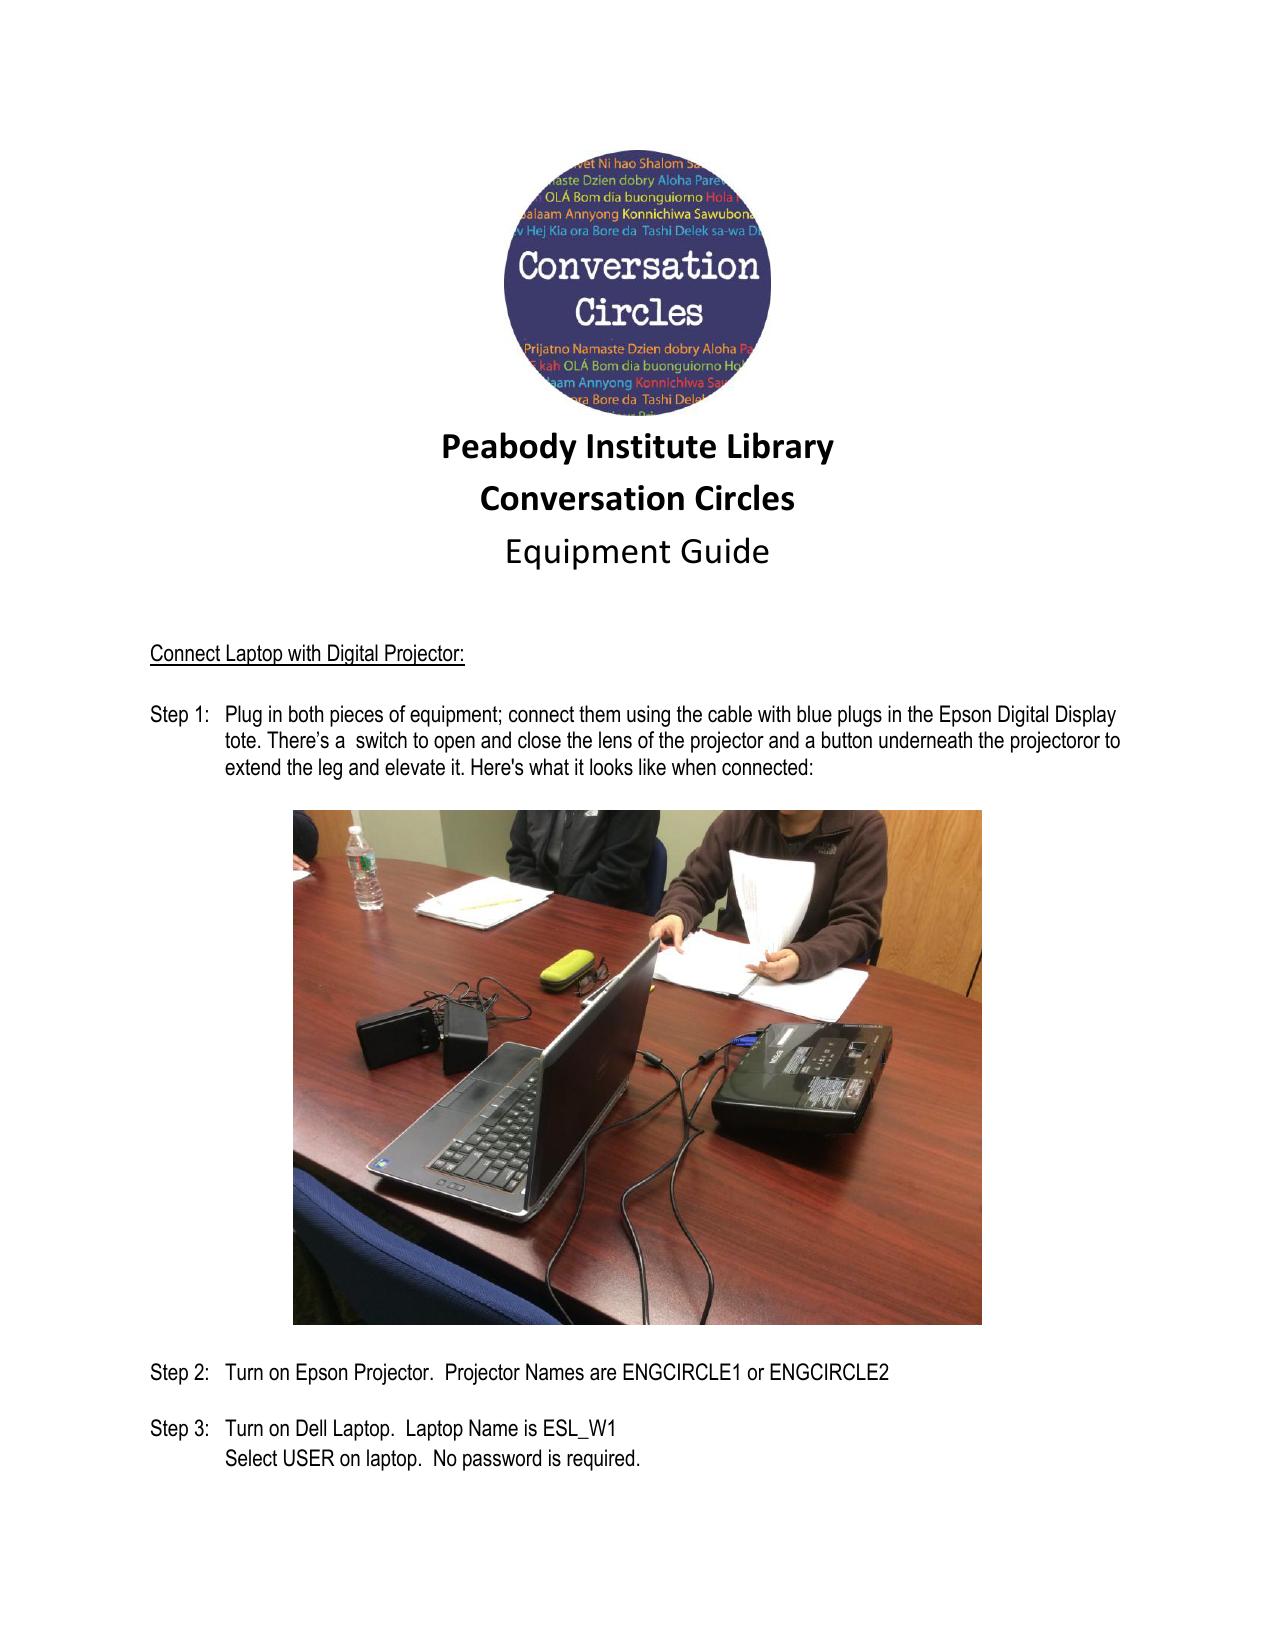 Peabody Institute Library Conversation Circles Equipment